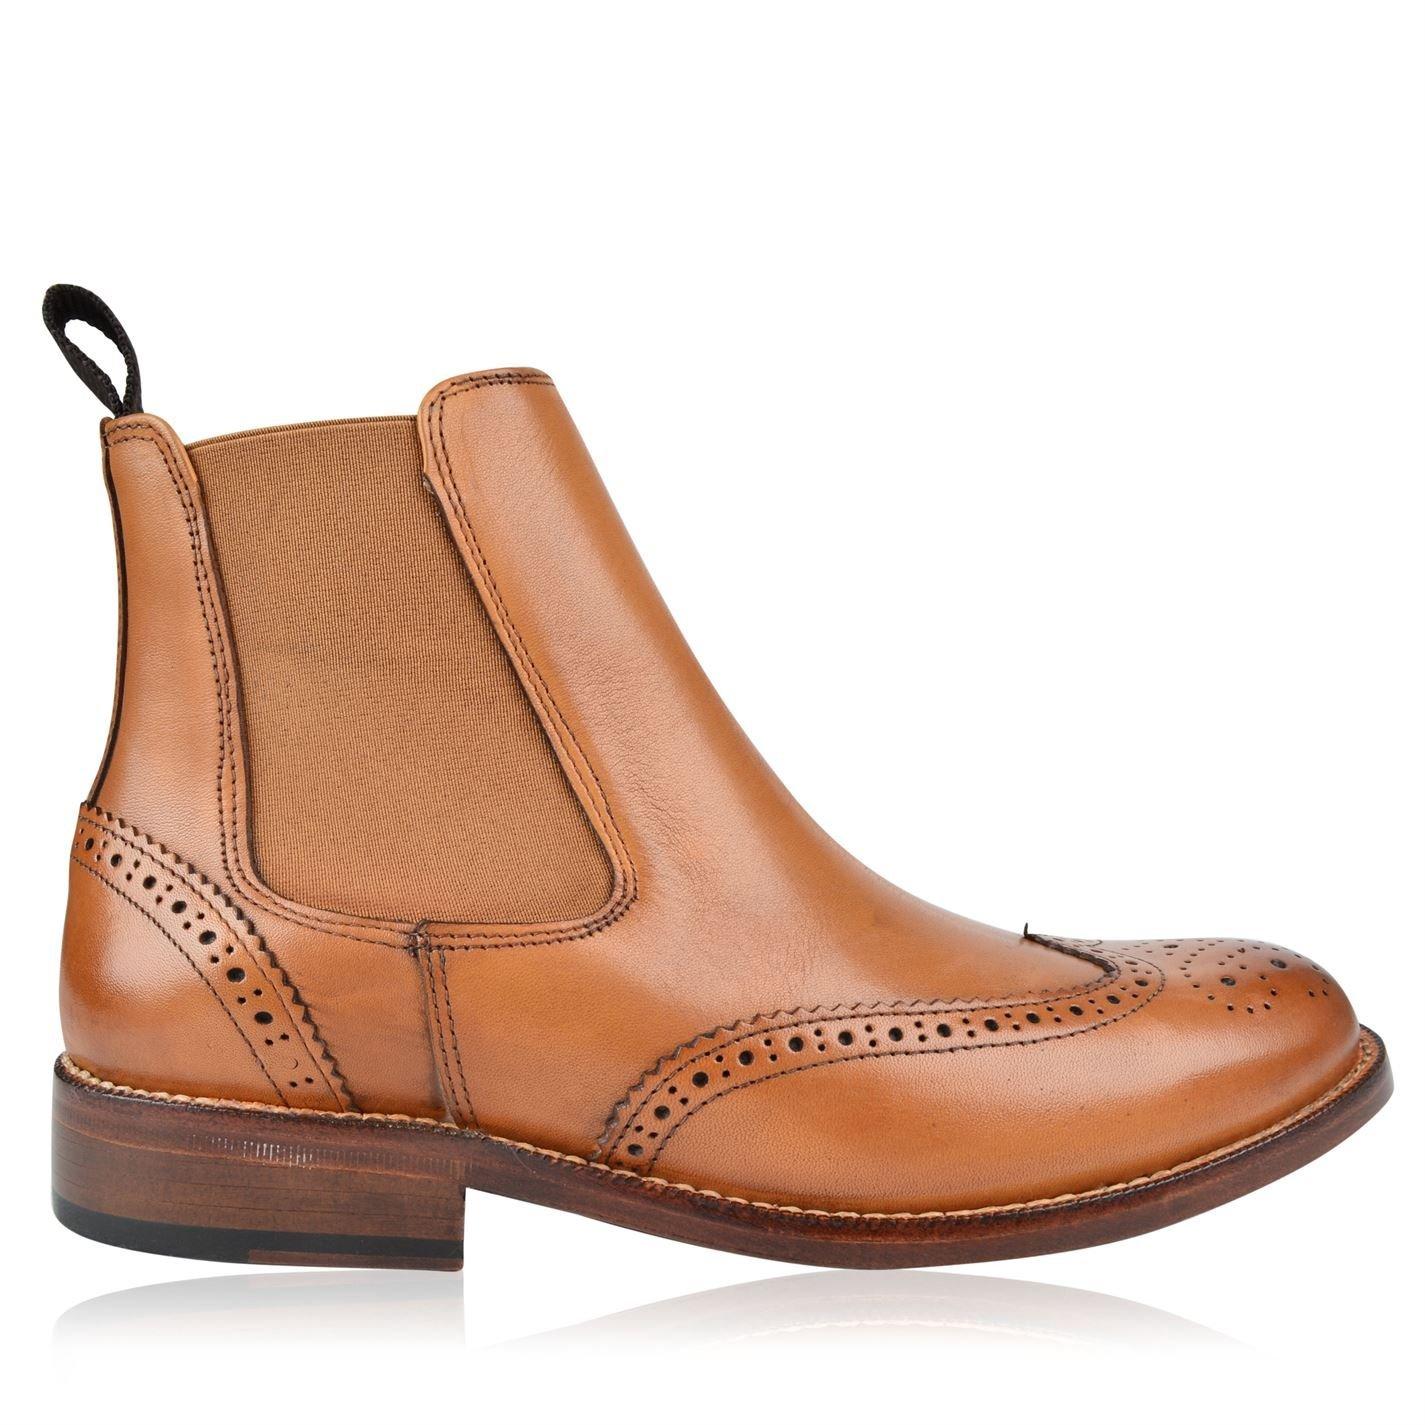 Full Circle Cobham Herren Stiefeletten Smart Freizeit Ankle Ankle Ankle Stiefel Leder Schuhe bb1153